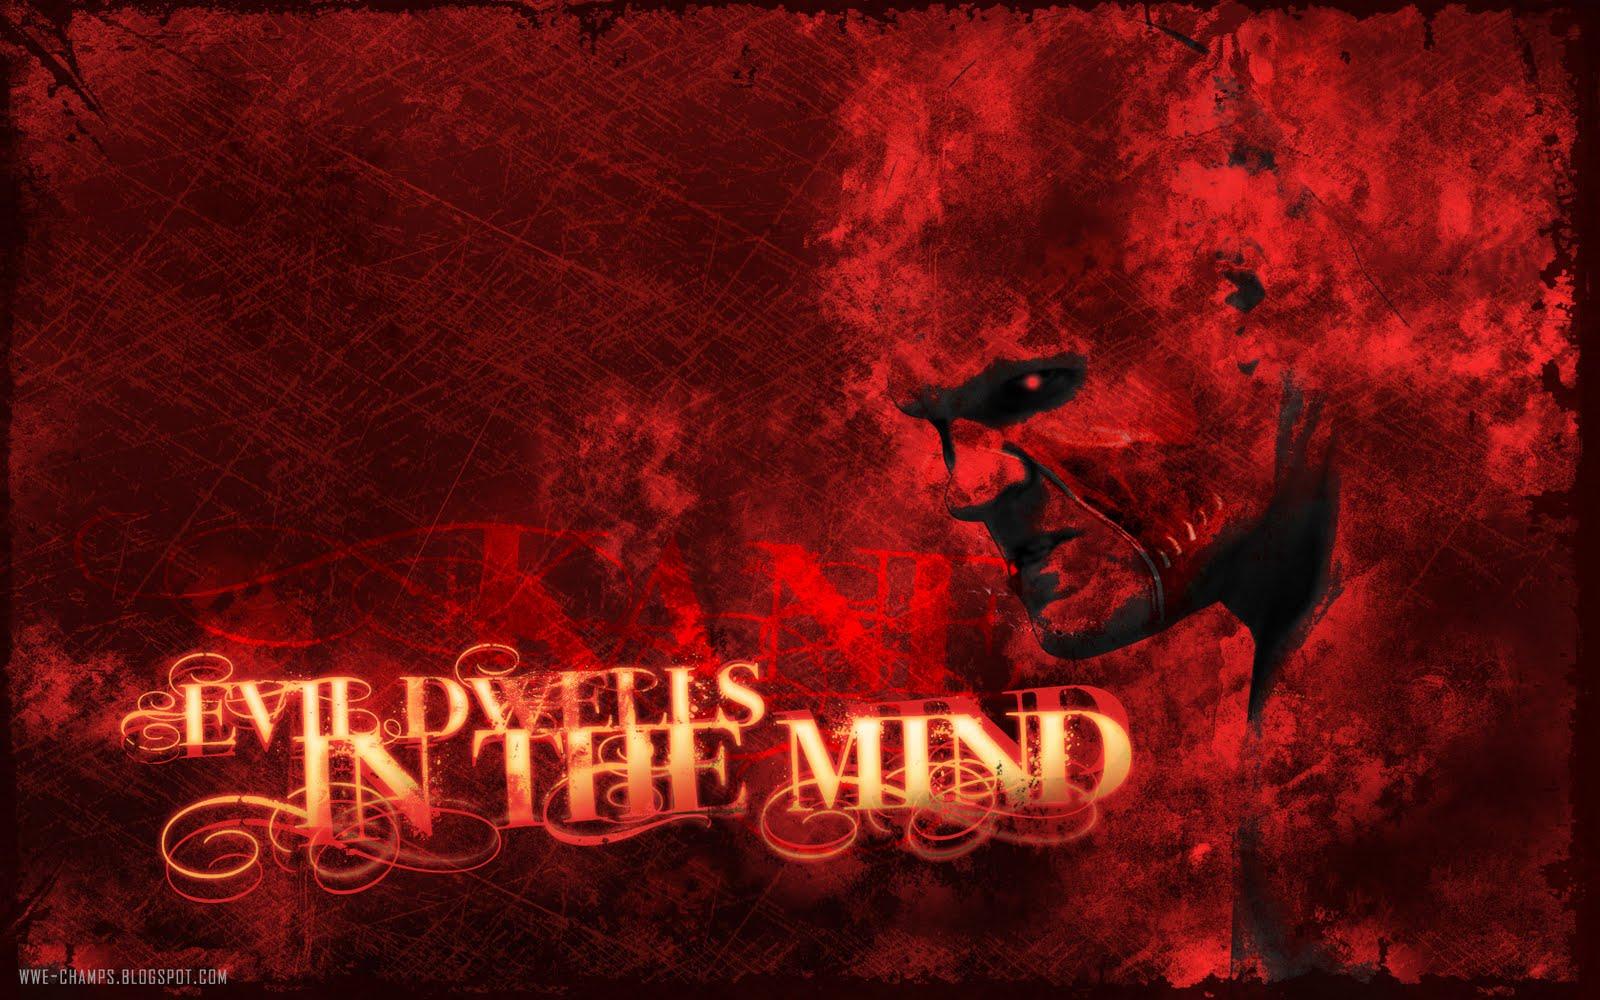 http://4.bp.blogspot.com/-tvSUyJoeKaM/TeS3_FA1BlI/AAAAAAAAA5o/Yw3LgzIcL5Q/s1600/kane_wallpaper_evildwellsinthemind_widescreen%2Bcopy.jpg